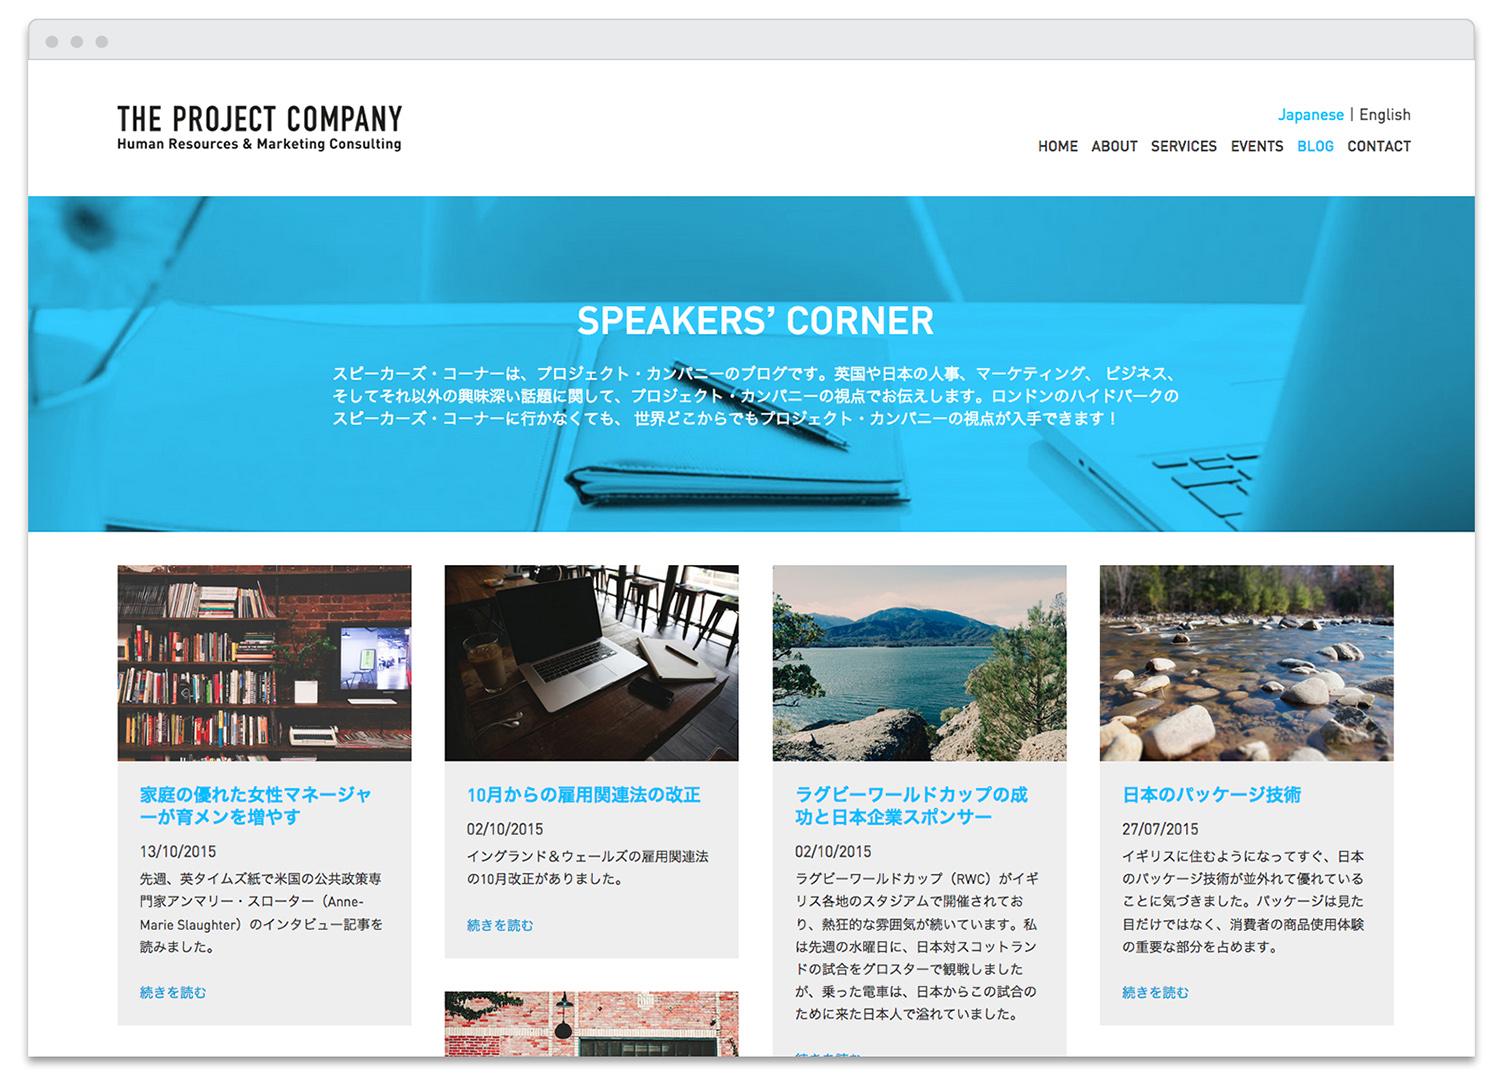 ProjectCompanyBrowser-blog